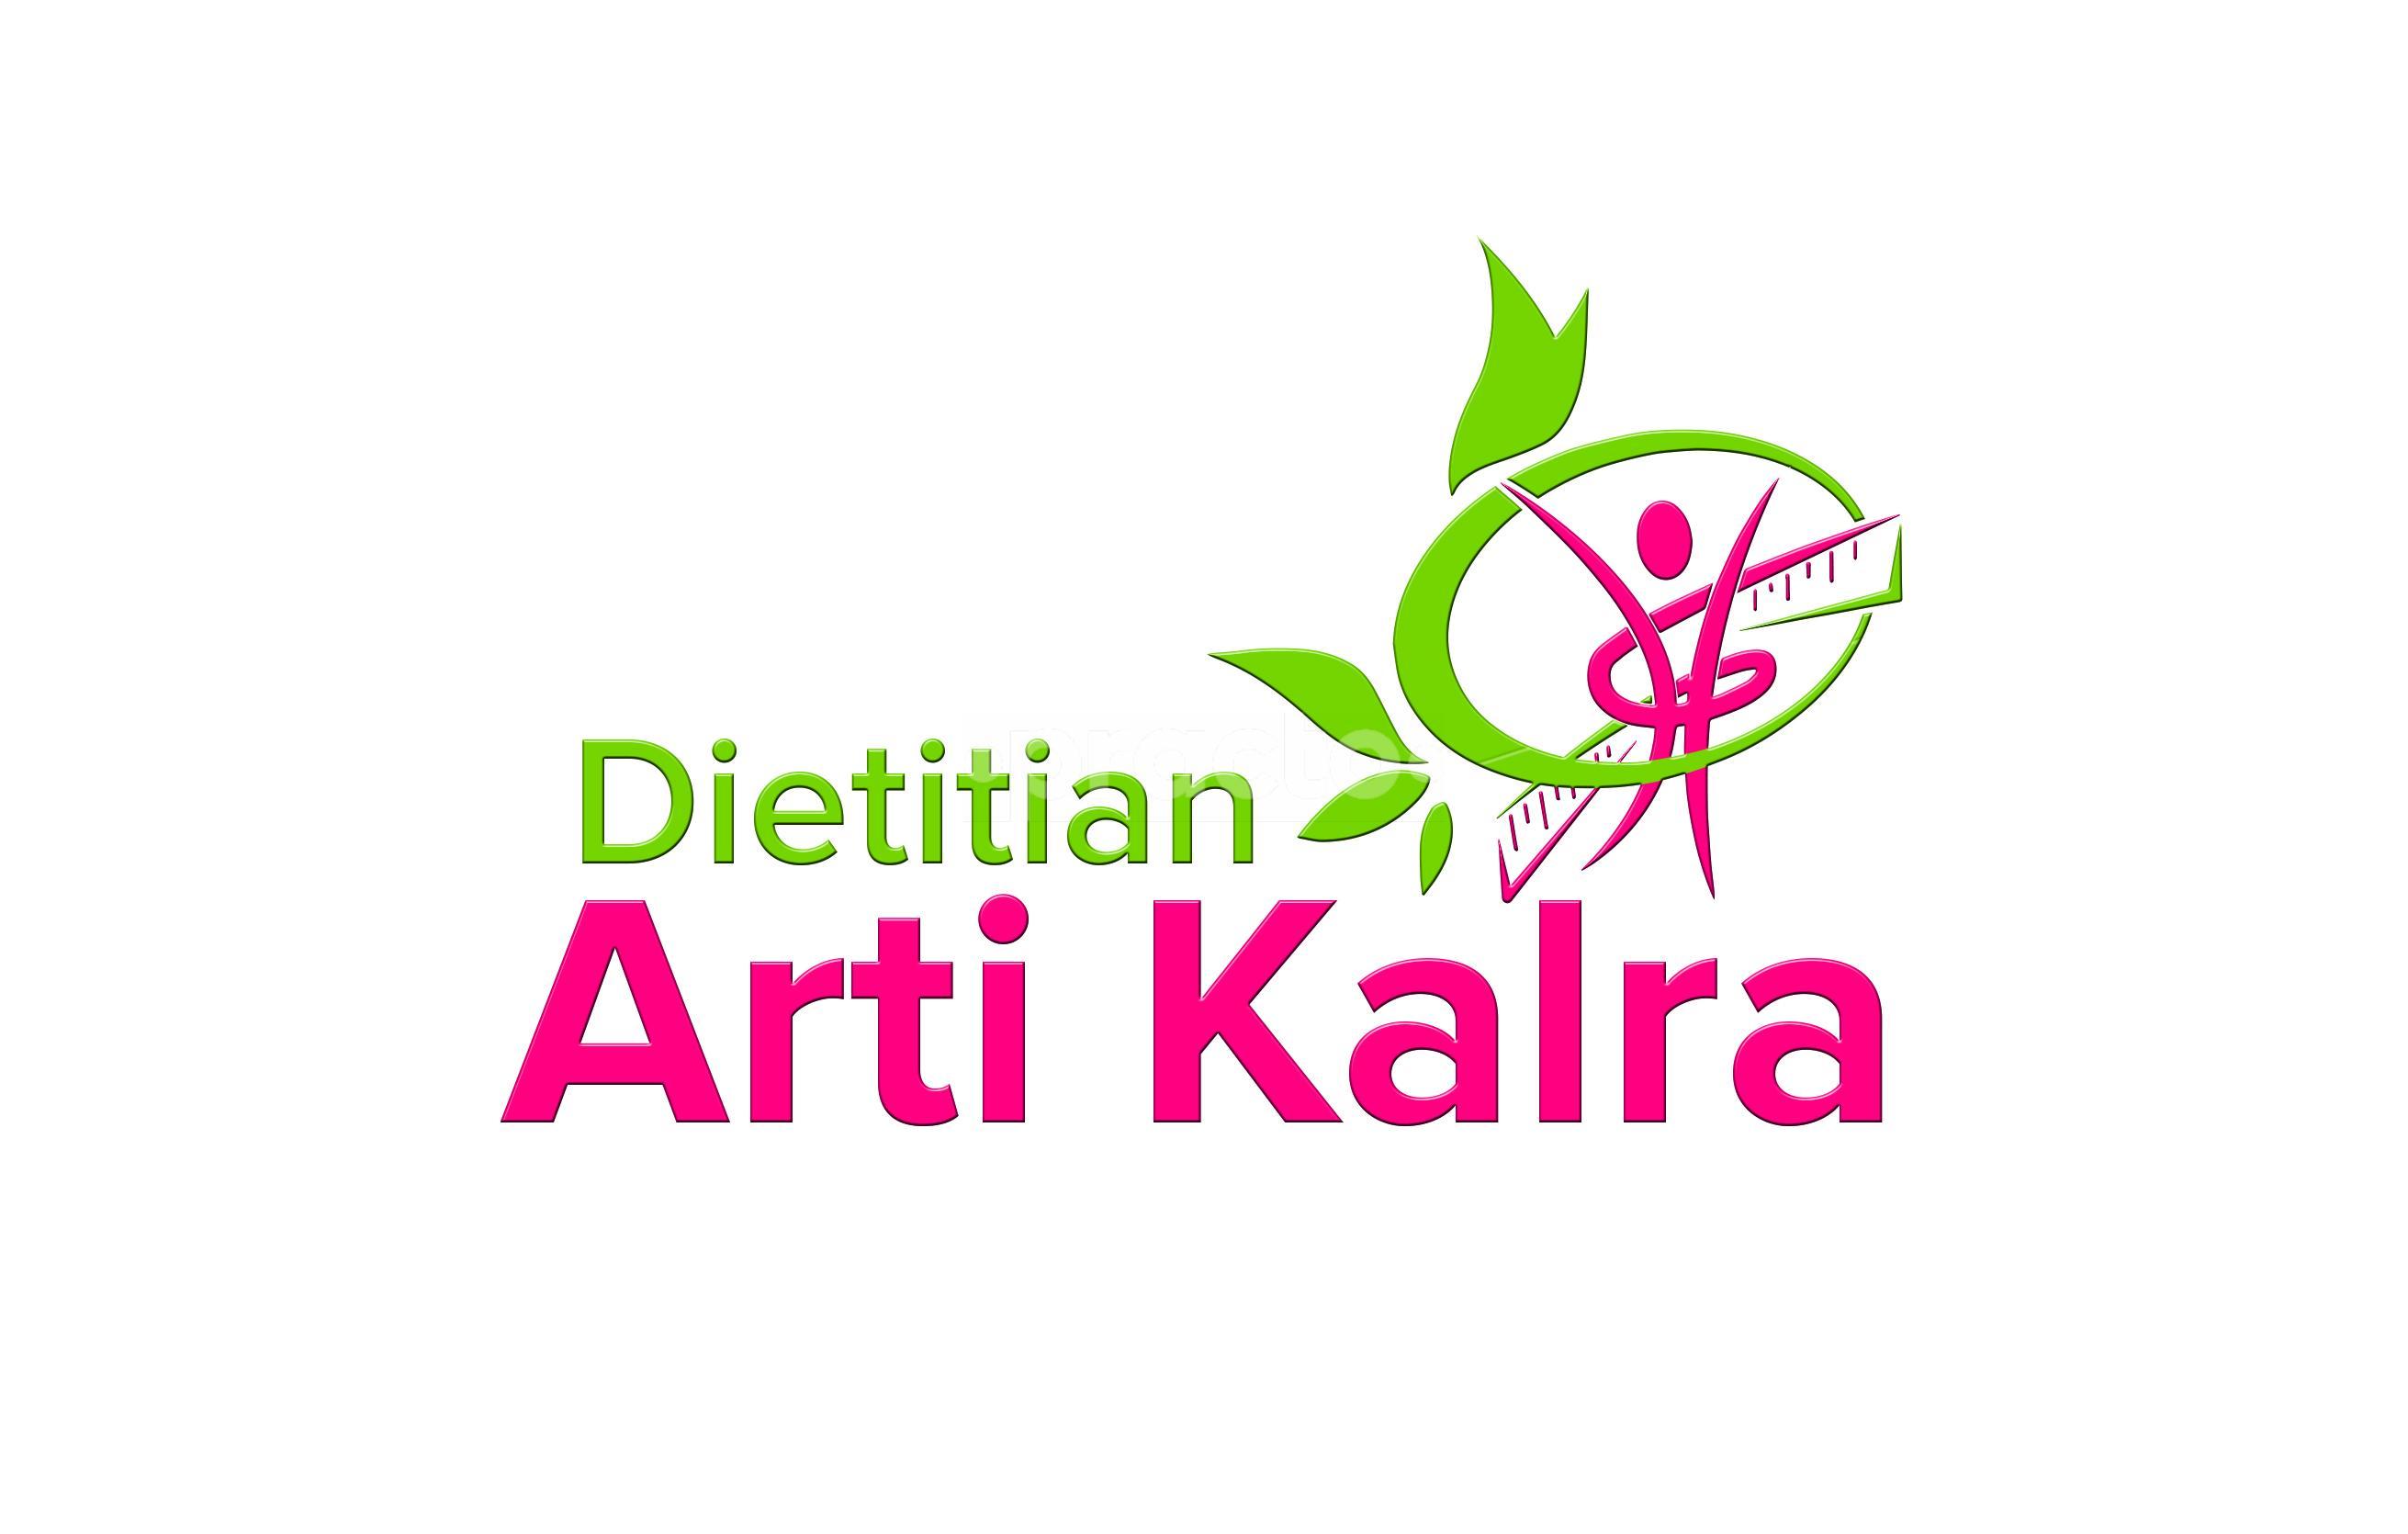 Dietitian Arti Kalra